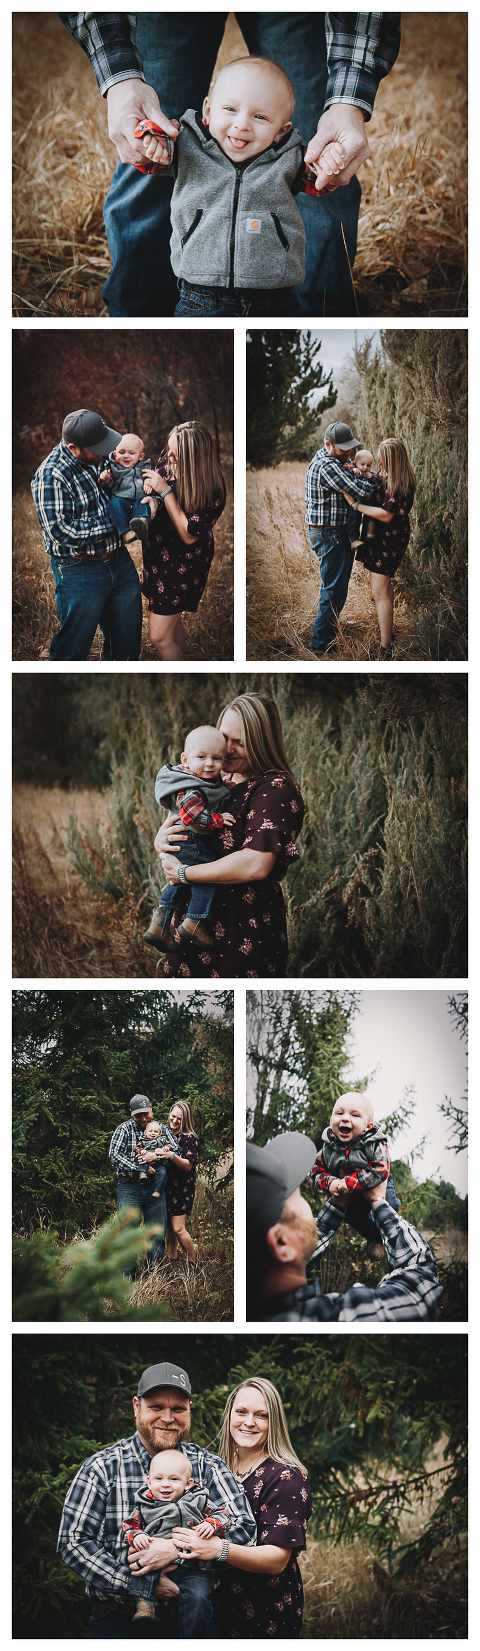 Haberman Family, Lifestyle session captured by Hailey Haberman, Ellensburg, WA